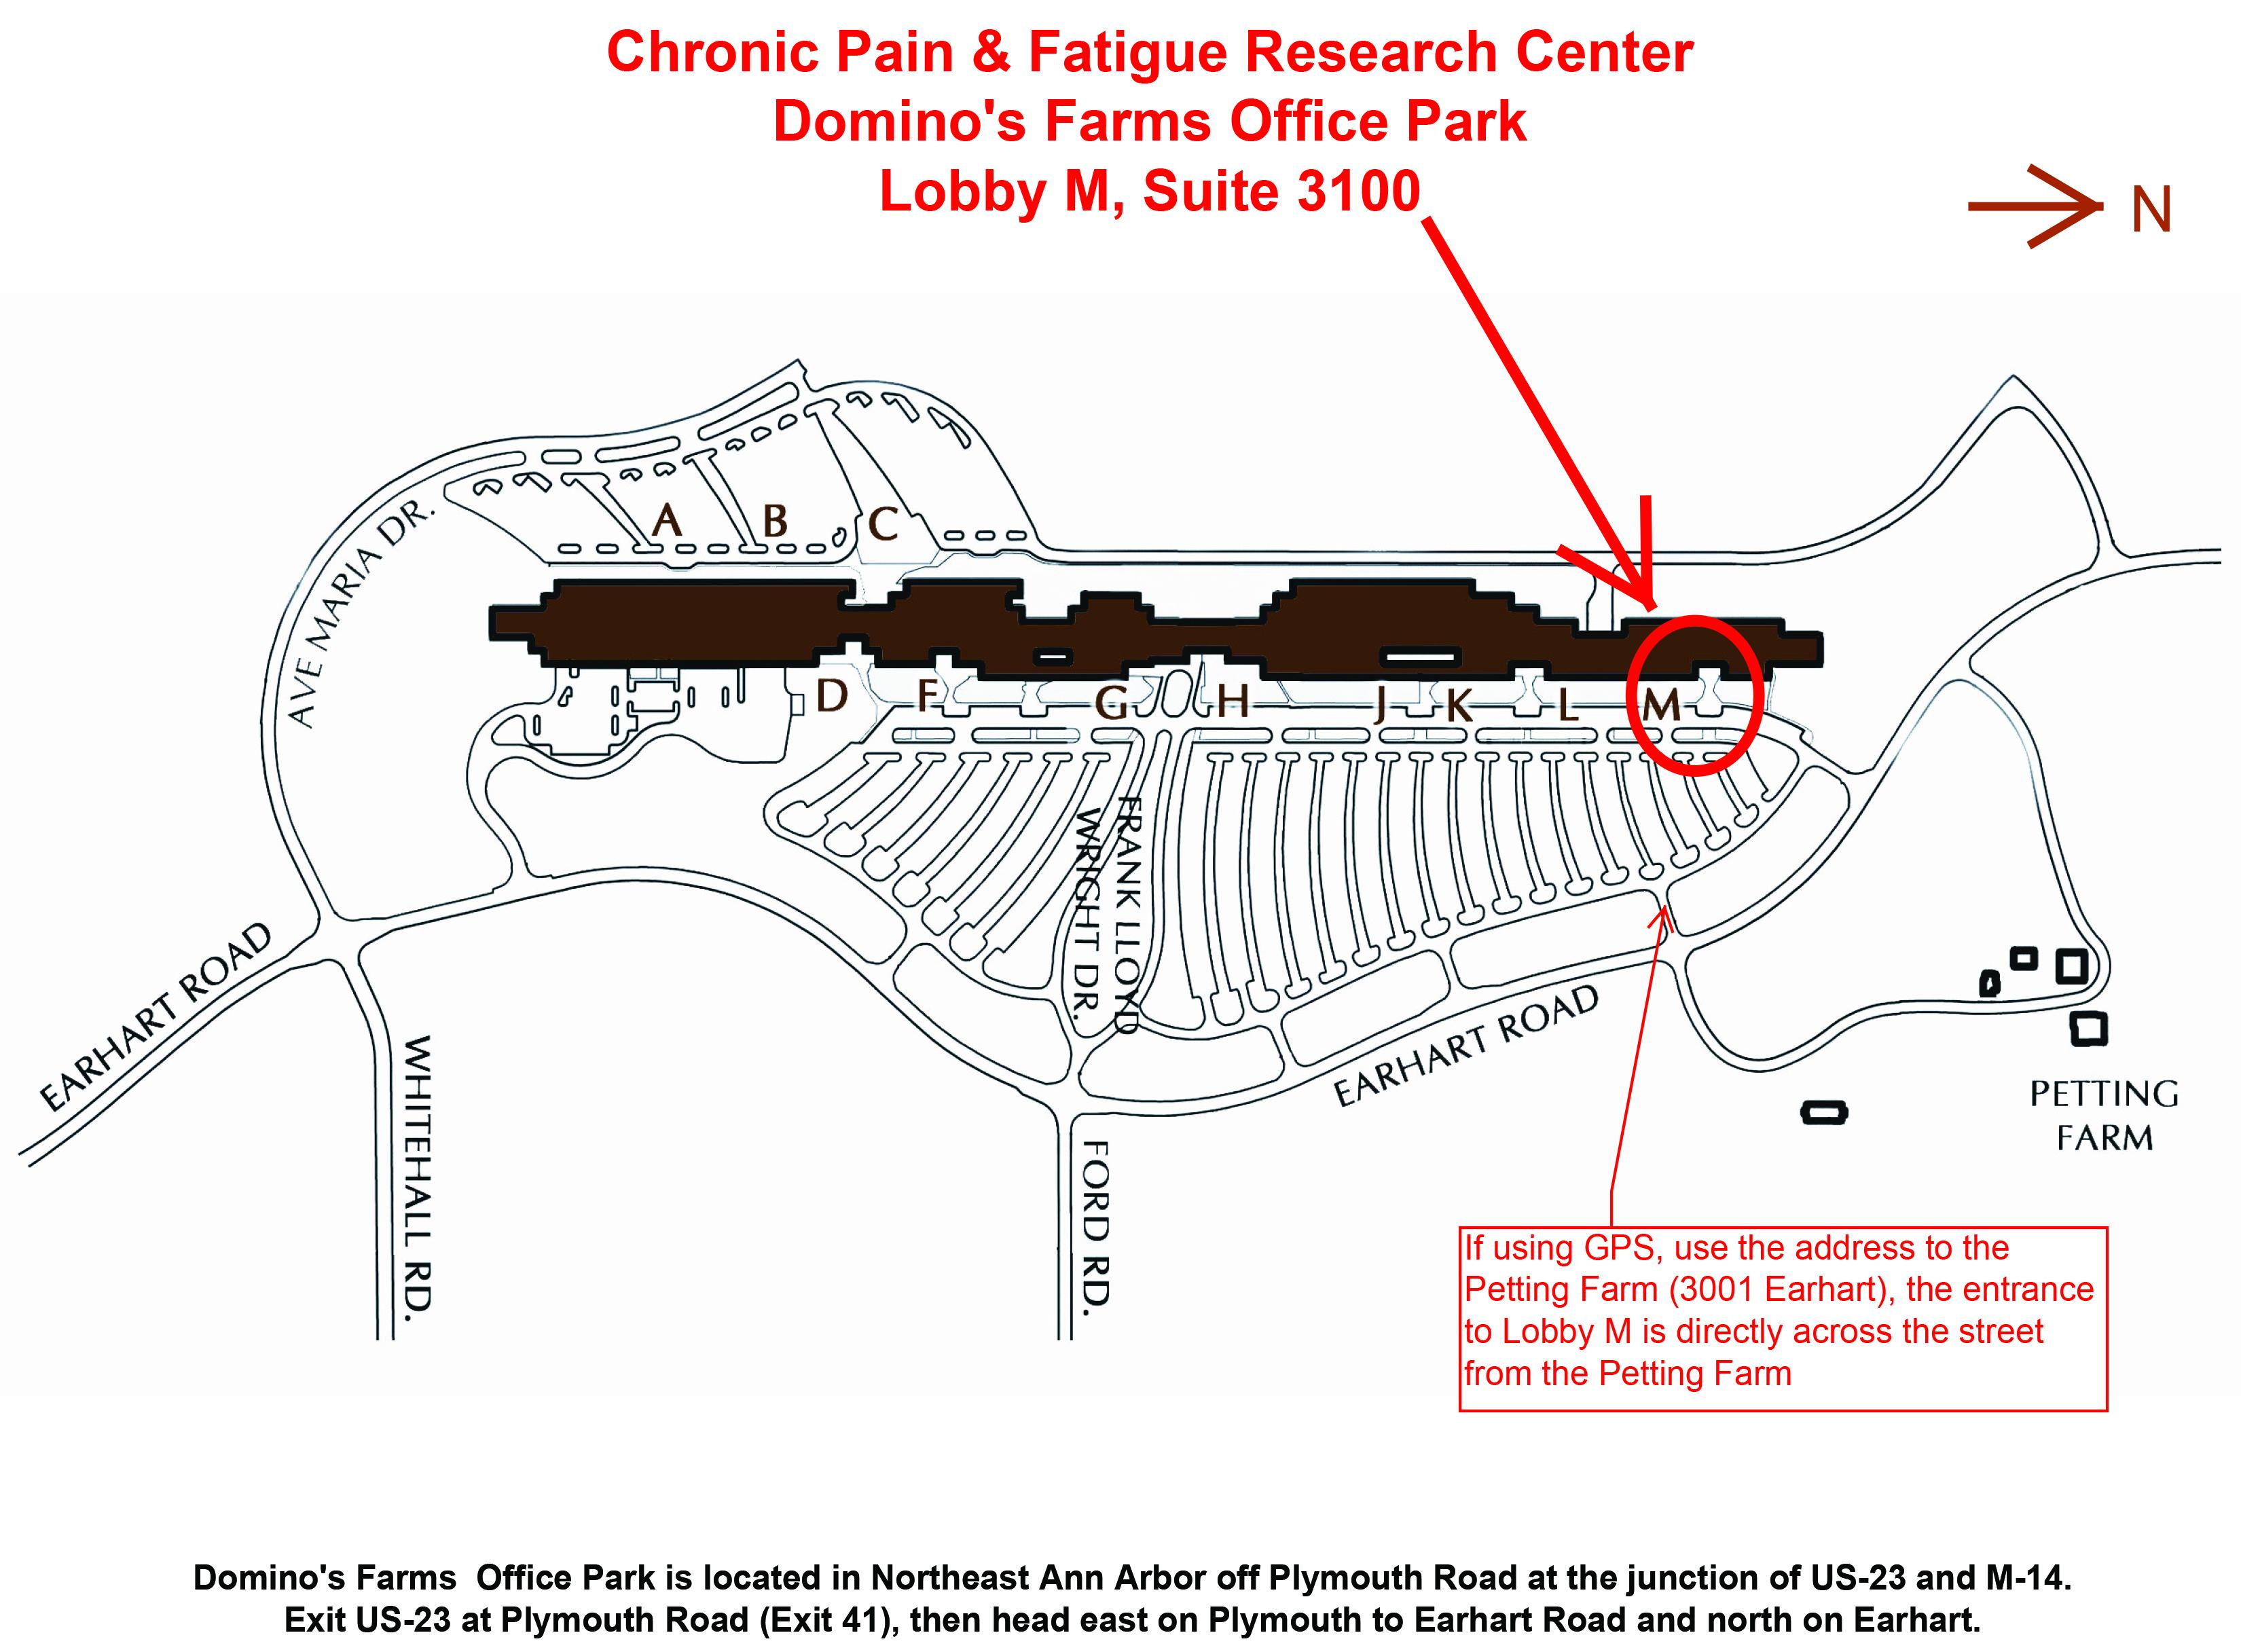 CPFRC Map